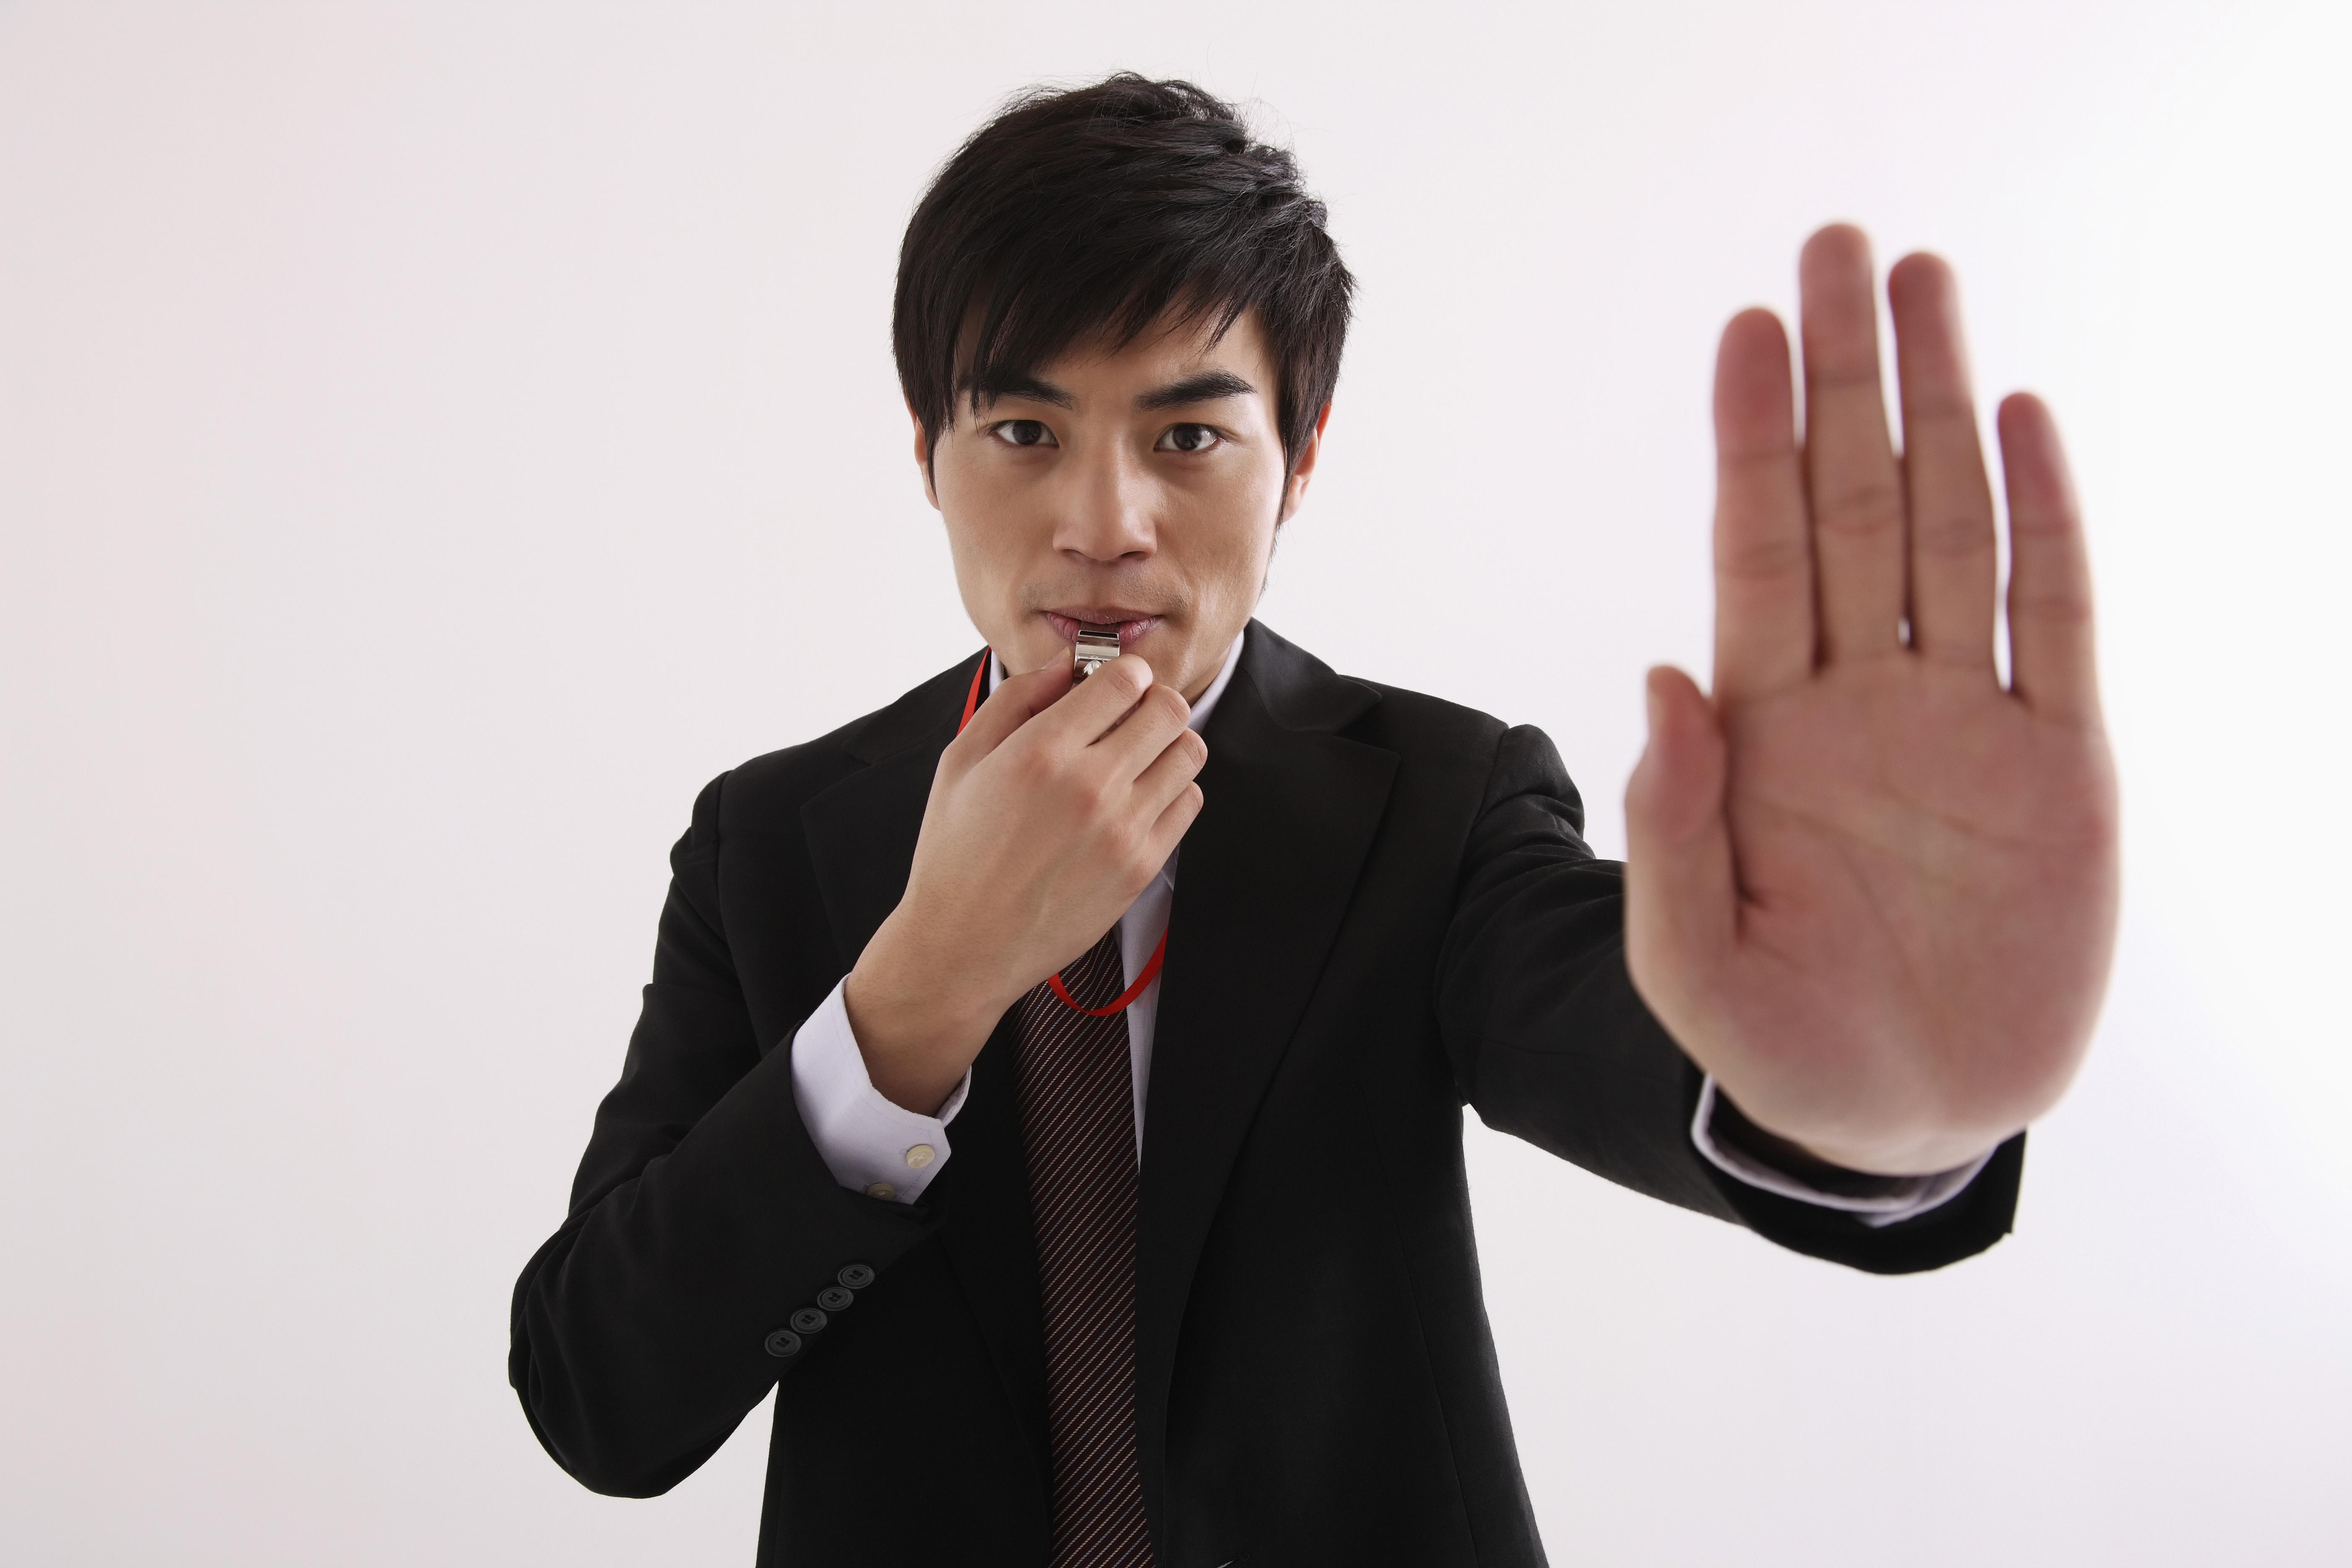 man holding hand up